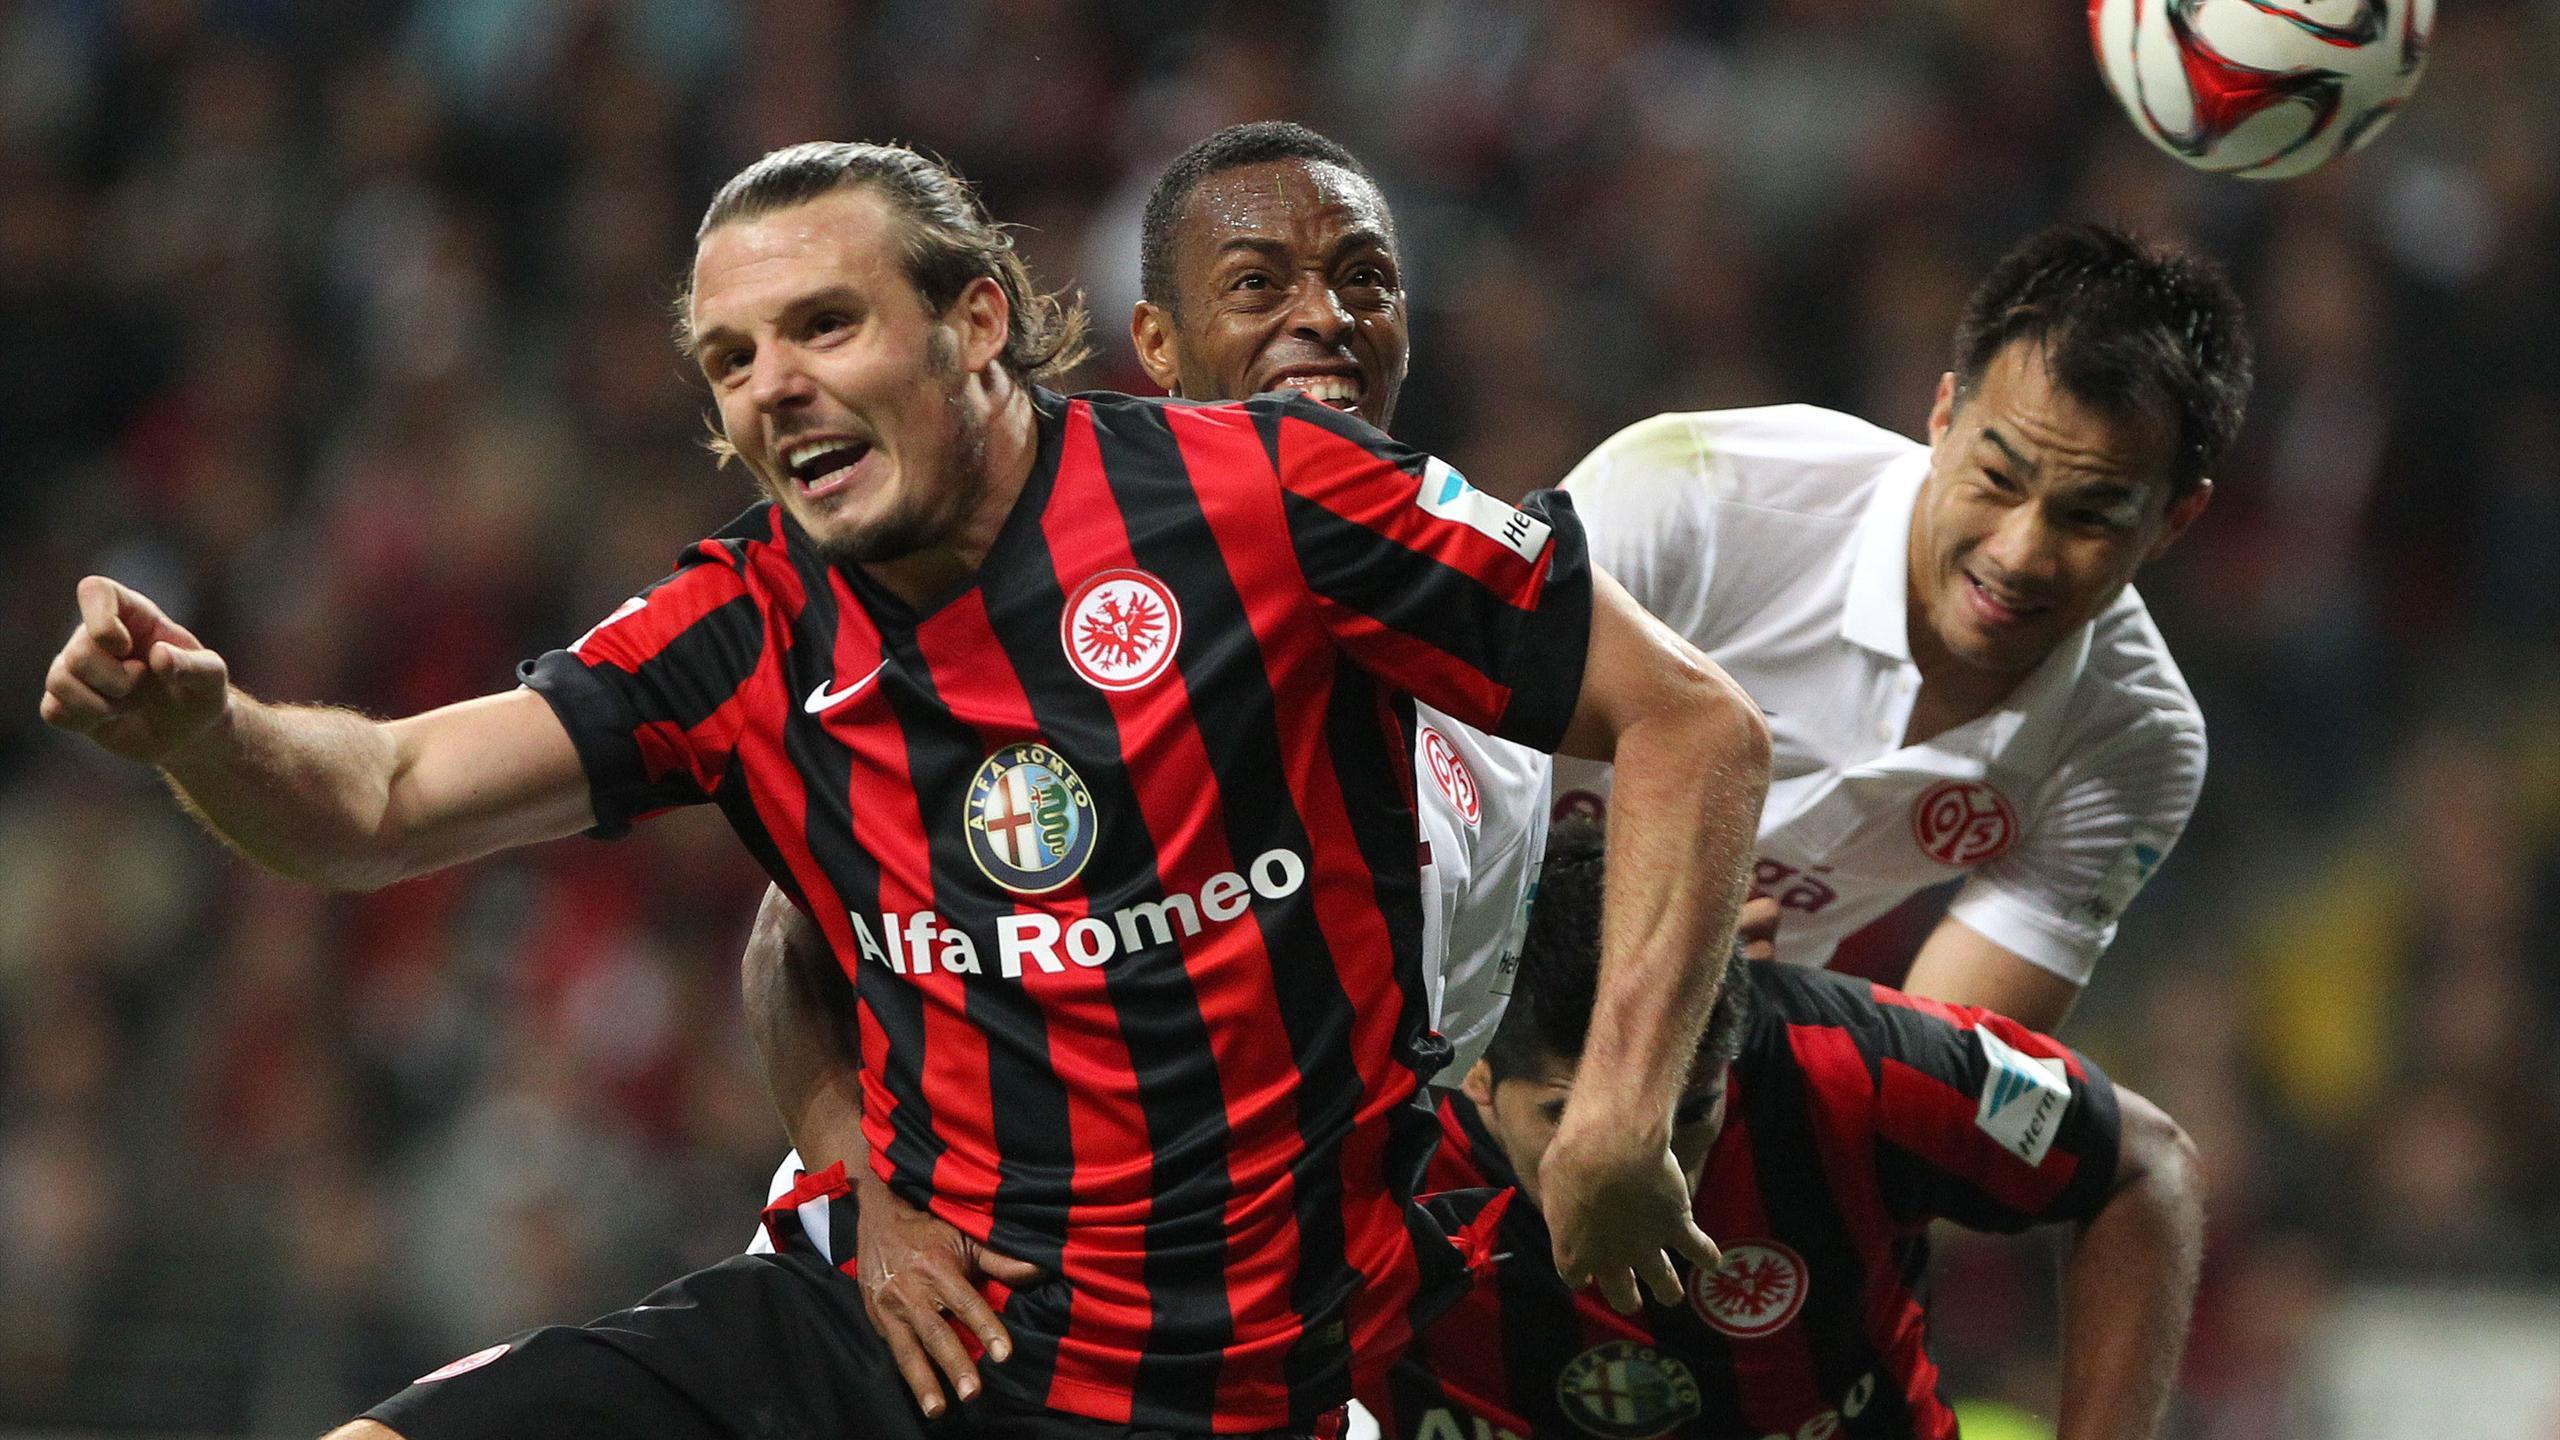 Video: Mainz 05 vs Eintracht Frankfurt